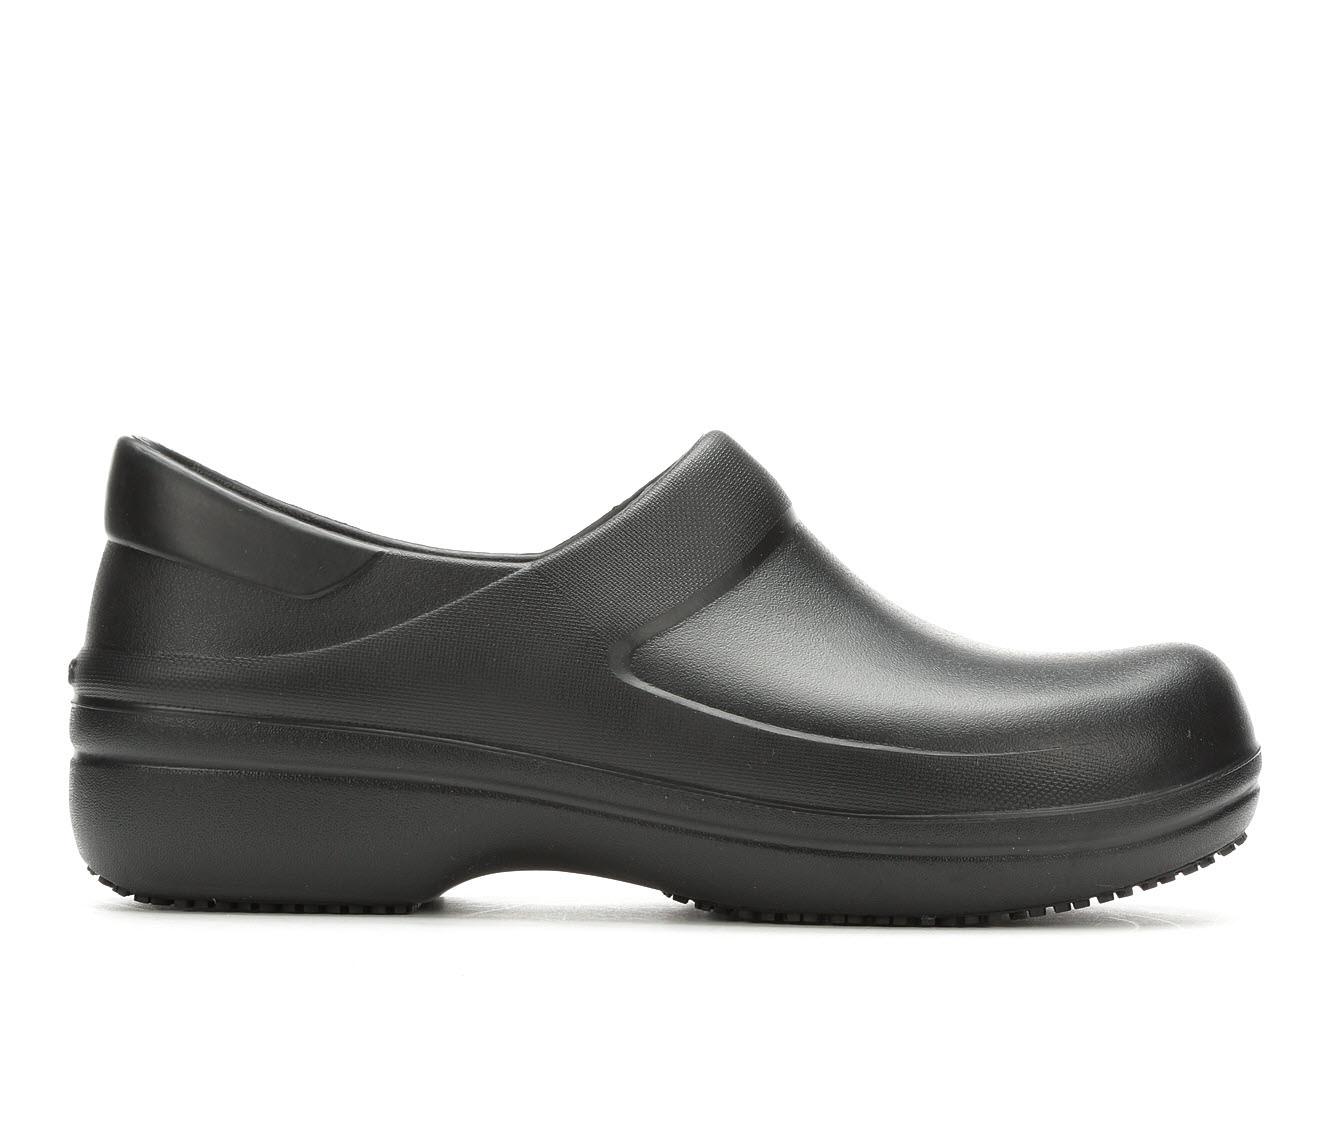 Crocs Work Neria Pro II Clog Men's Boots (Black Faux Leather)